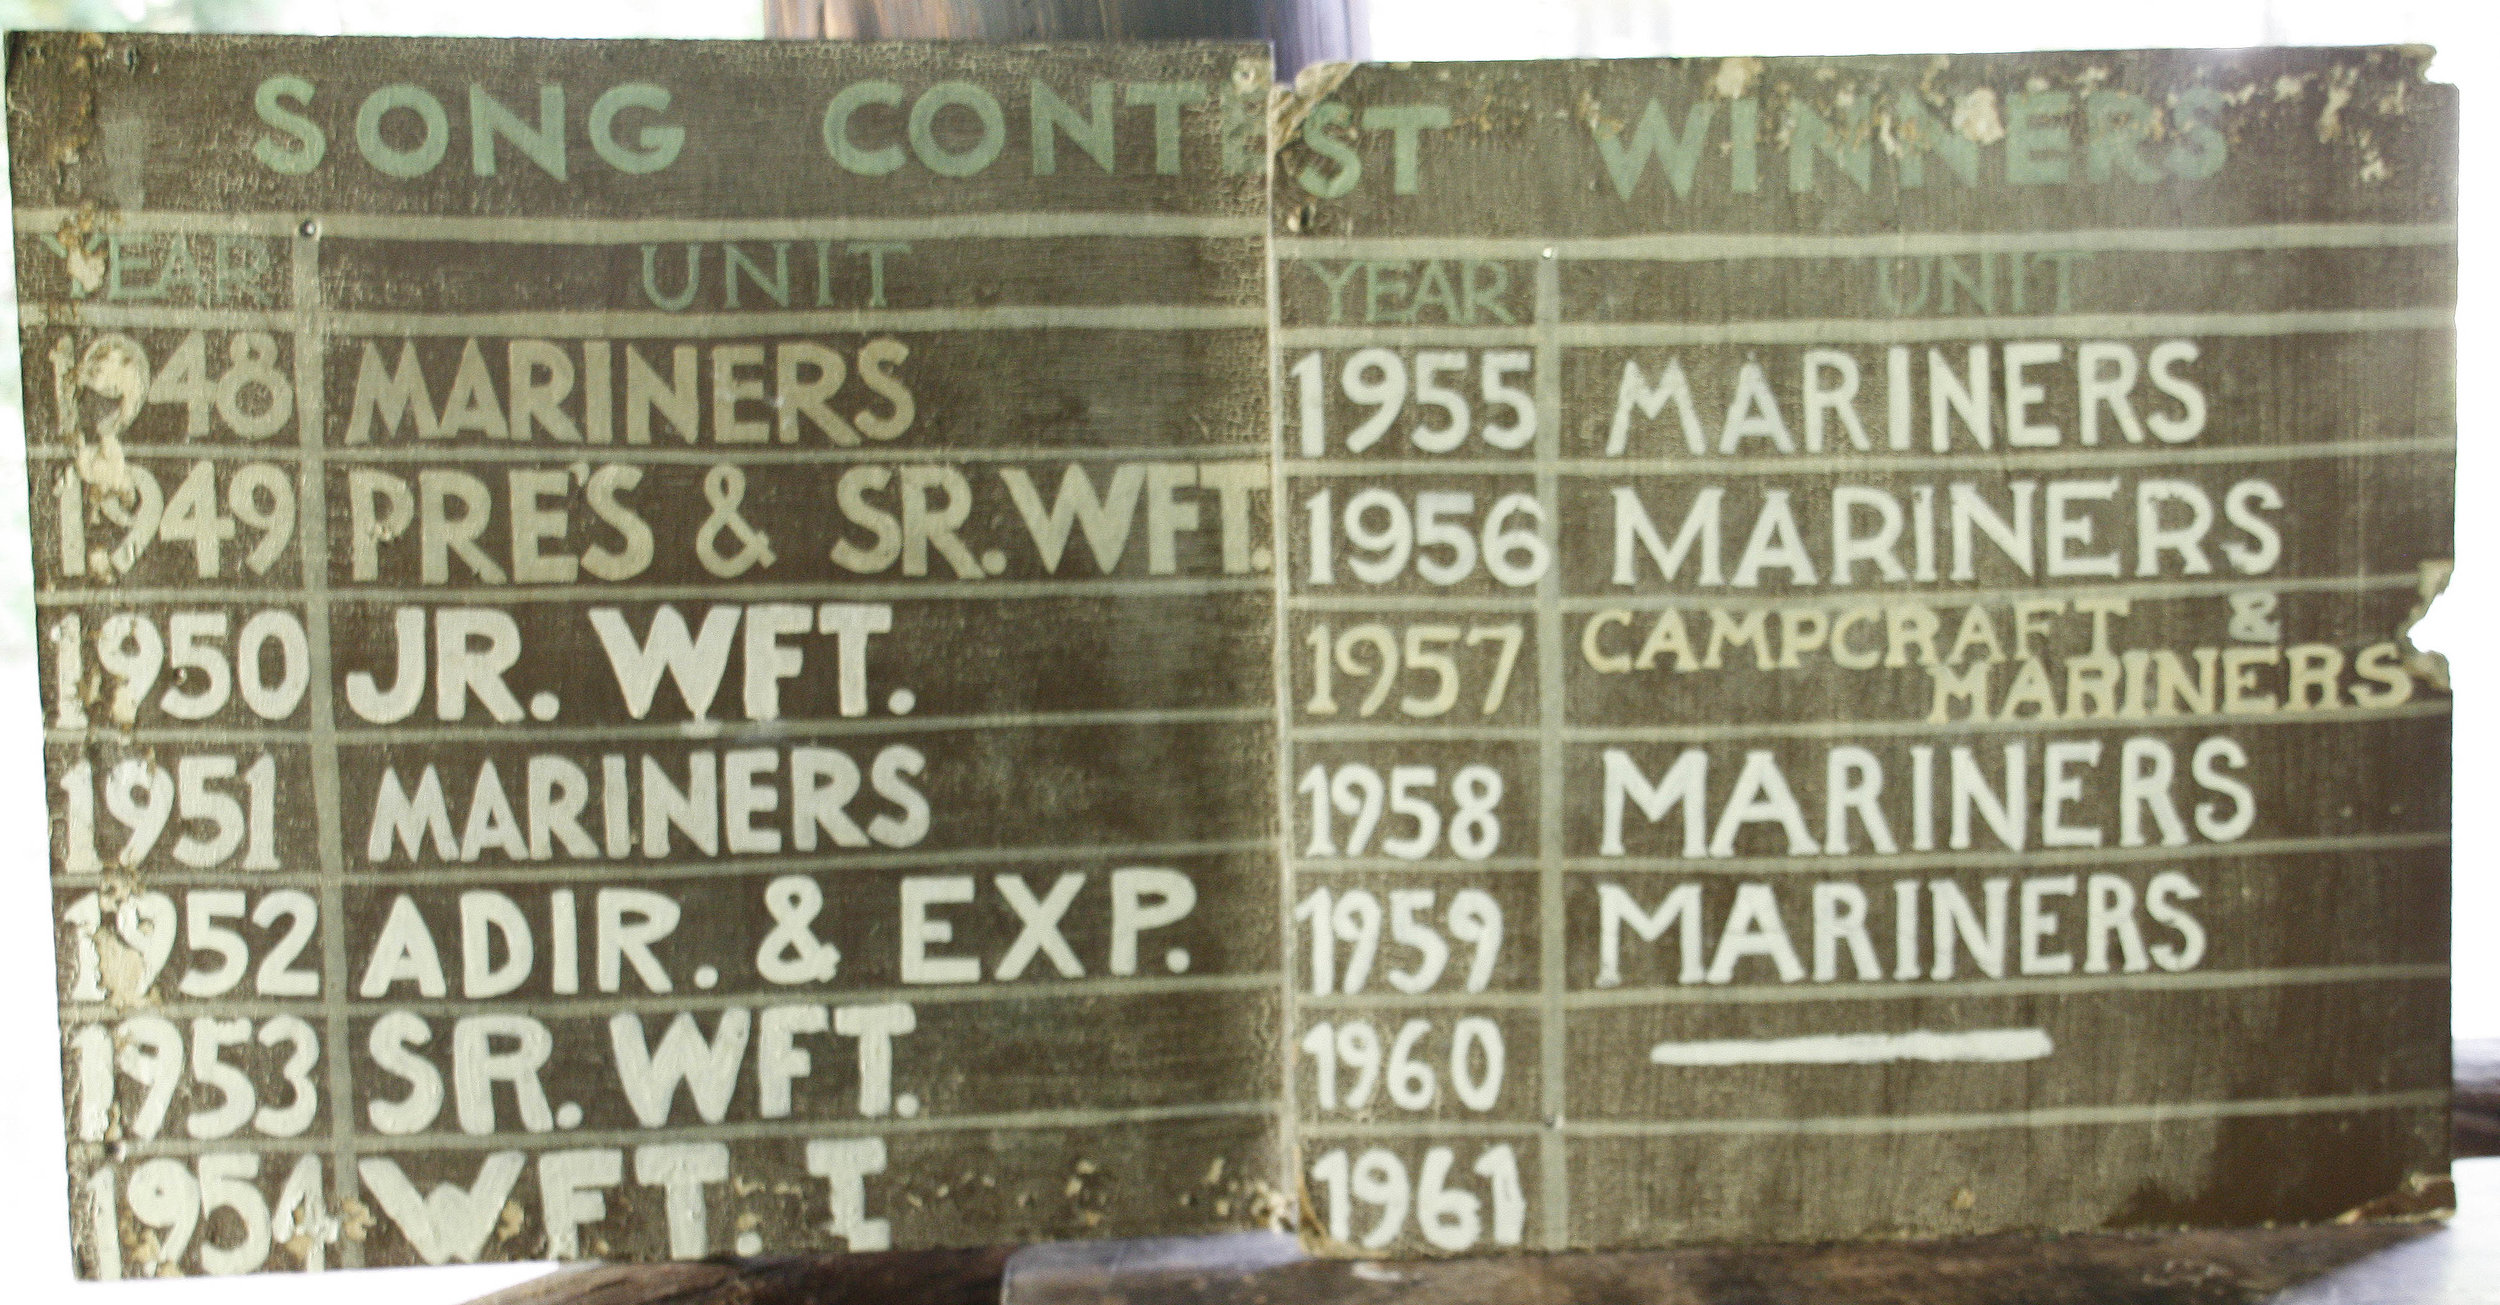 song-contest-winners-1948-1959_30538236158_o.jpg